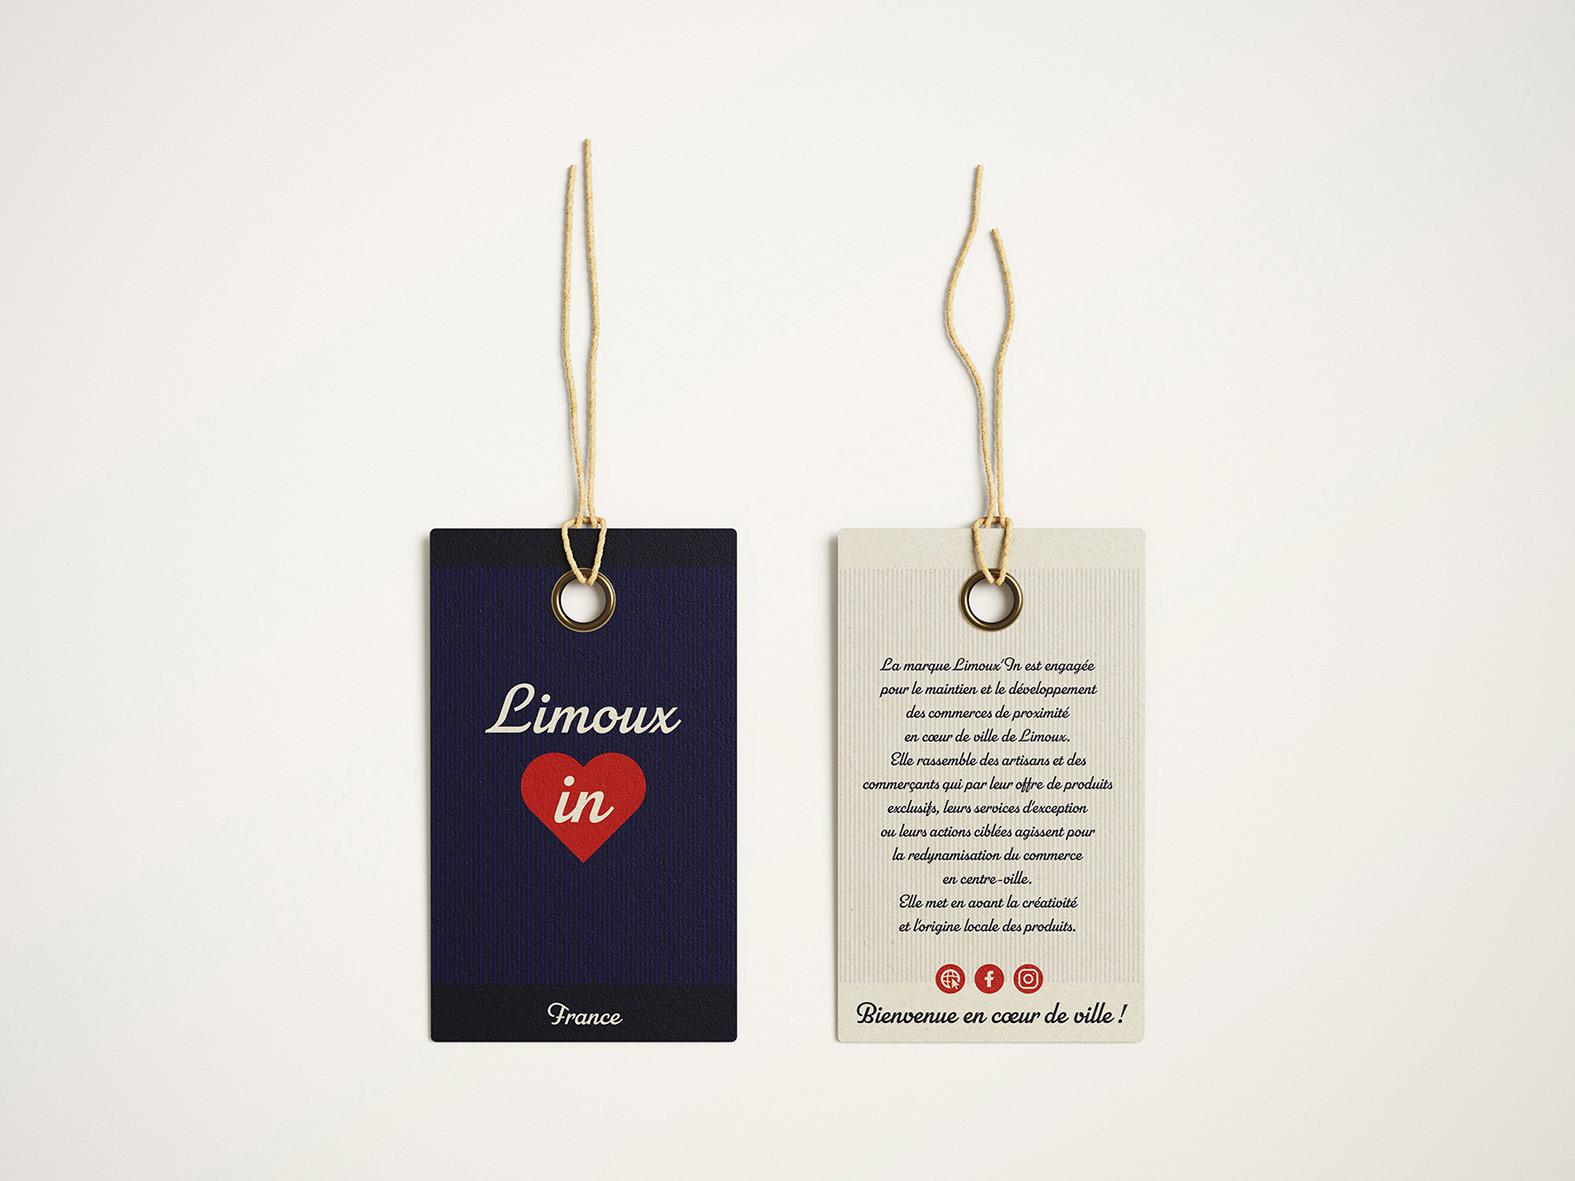 Coeur Limoux'in Etiquettes